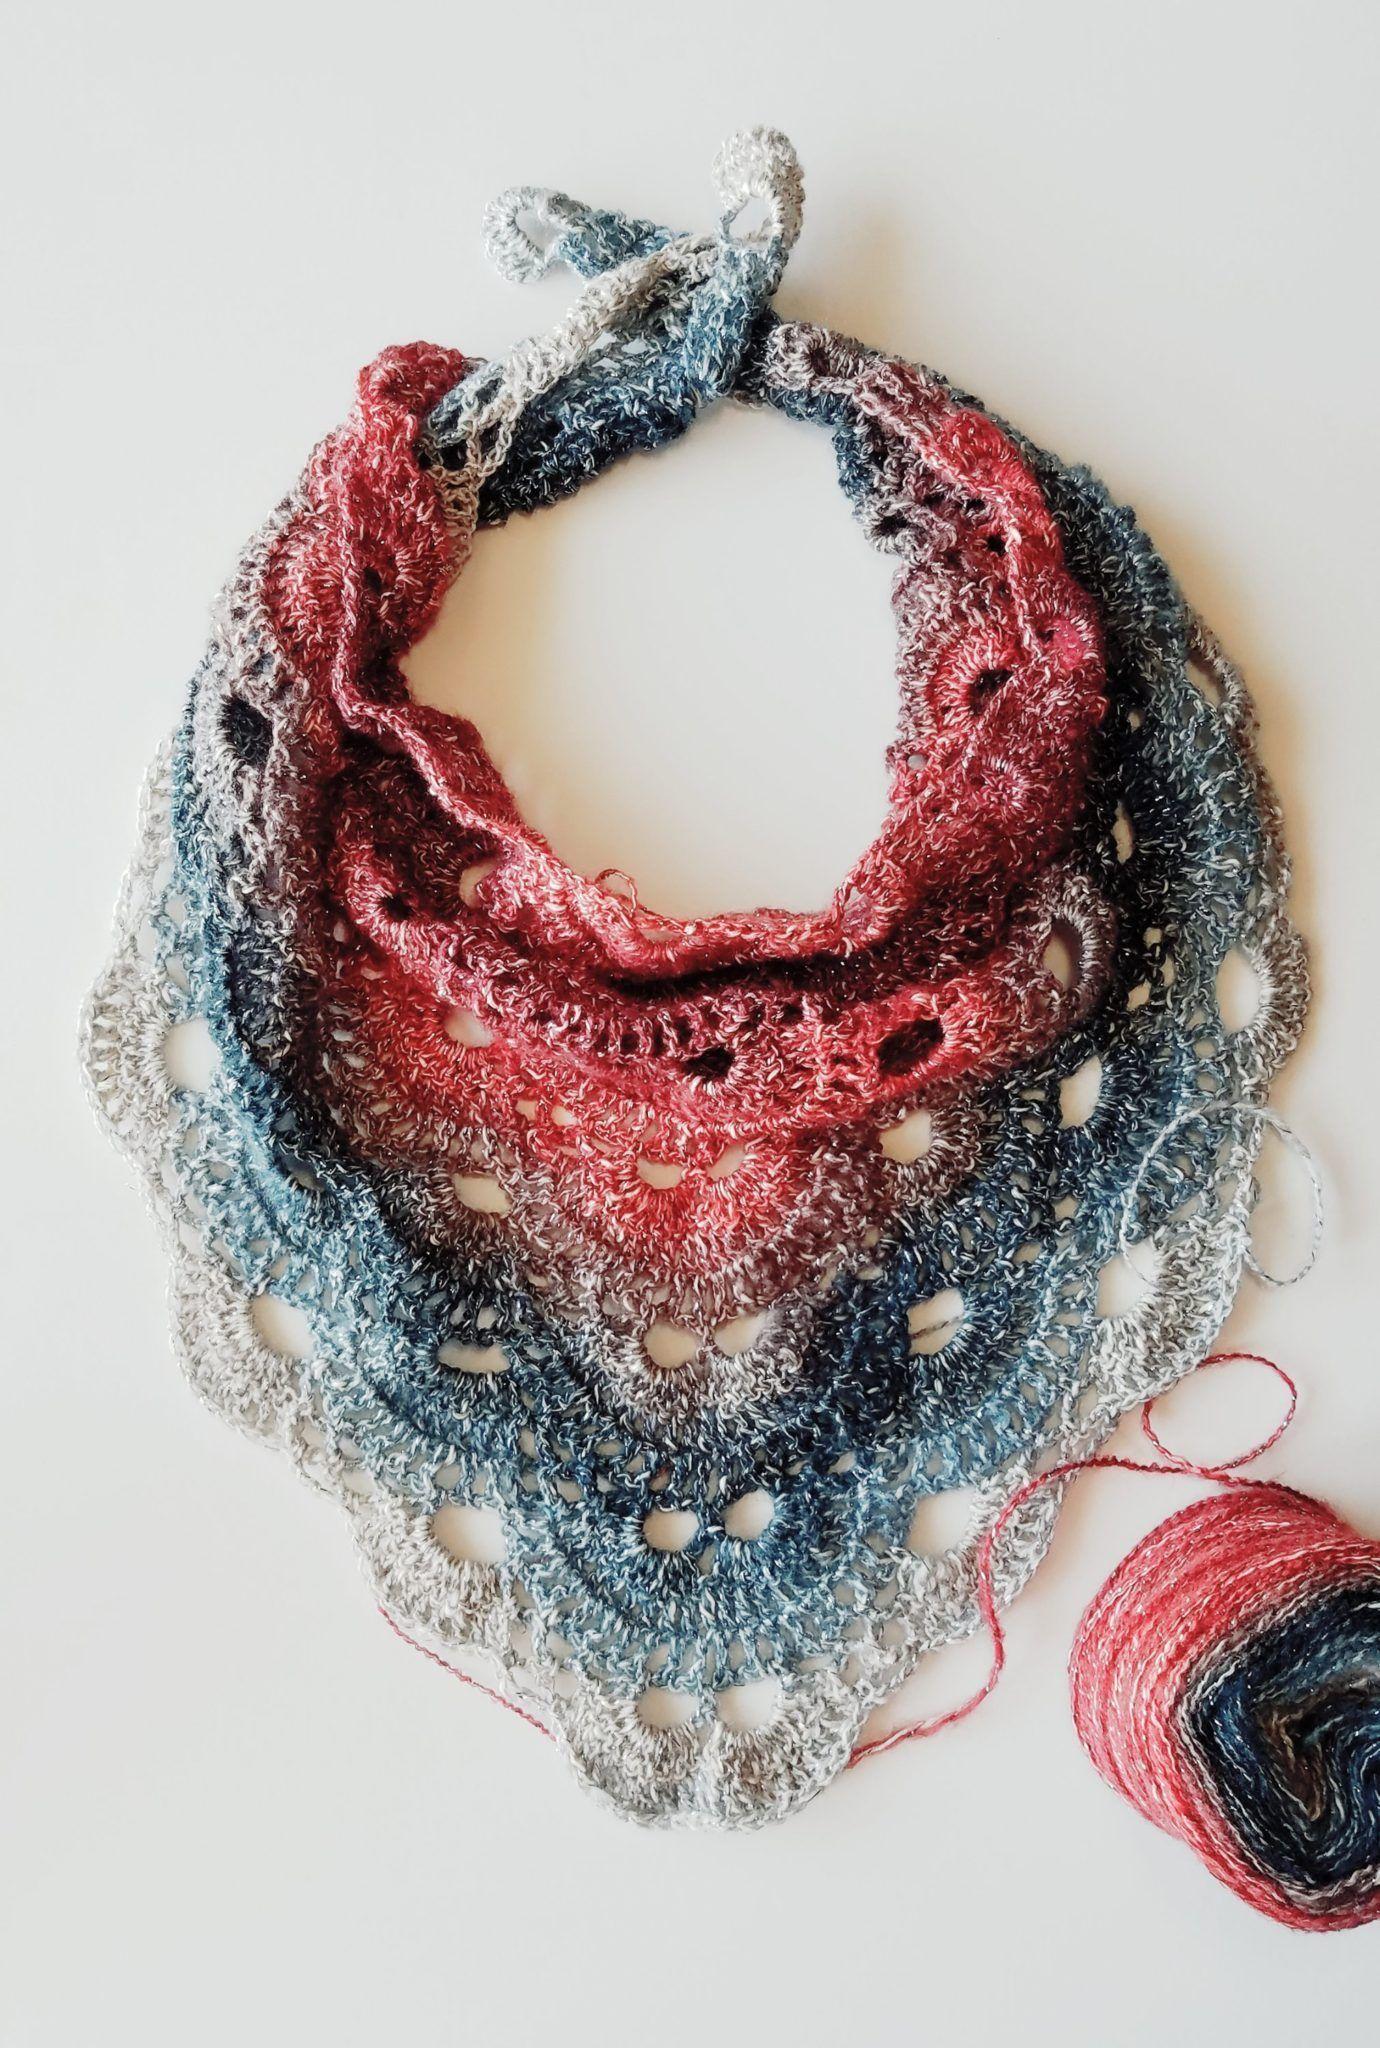 How to crochet Virus Scarf #crochetscarves